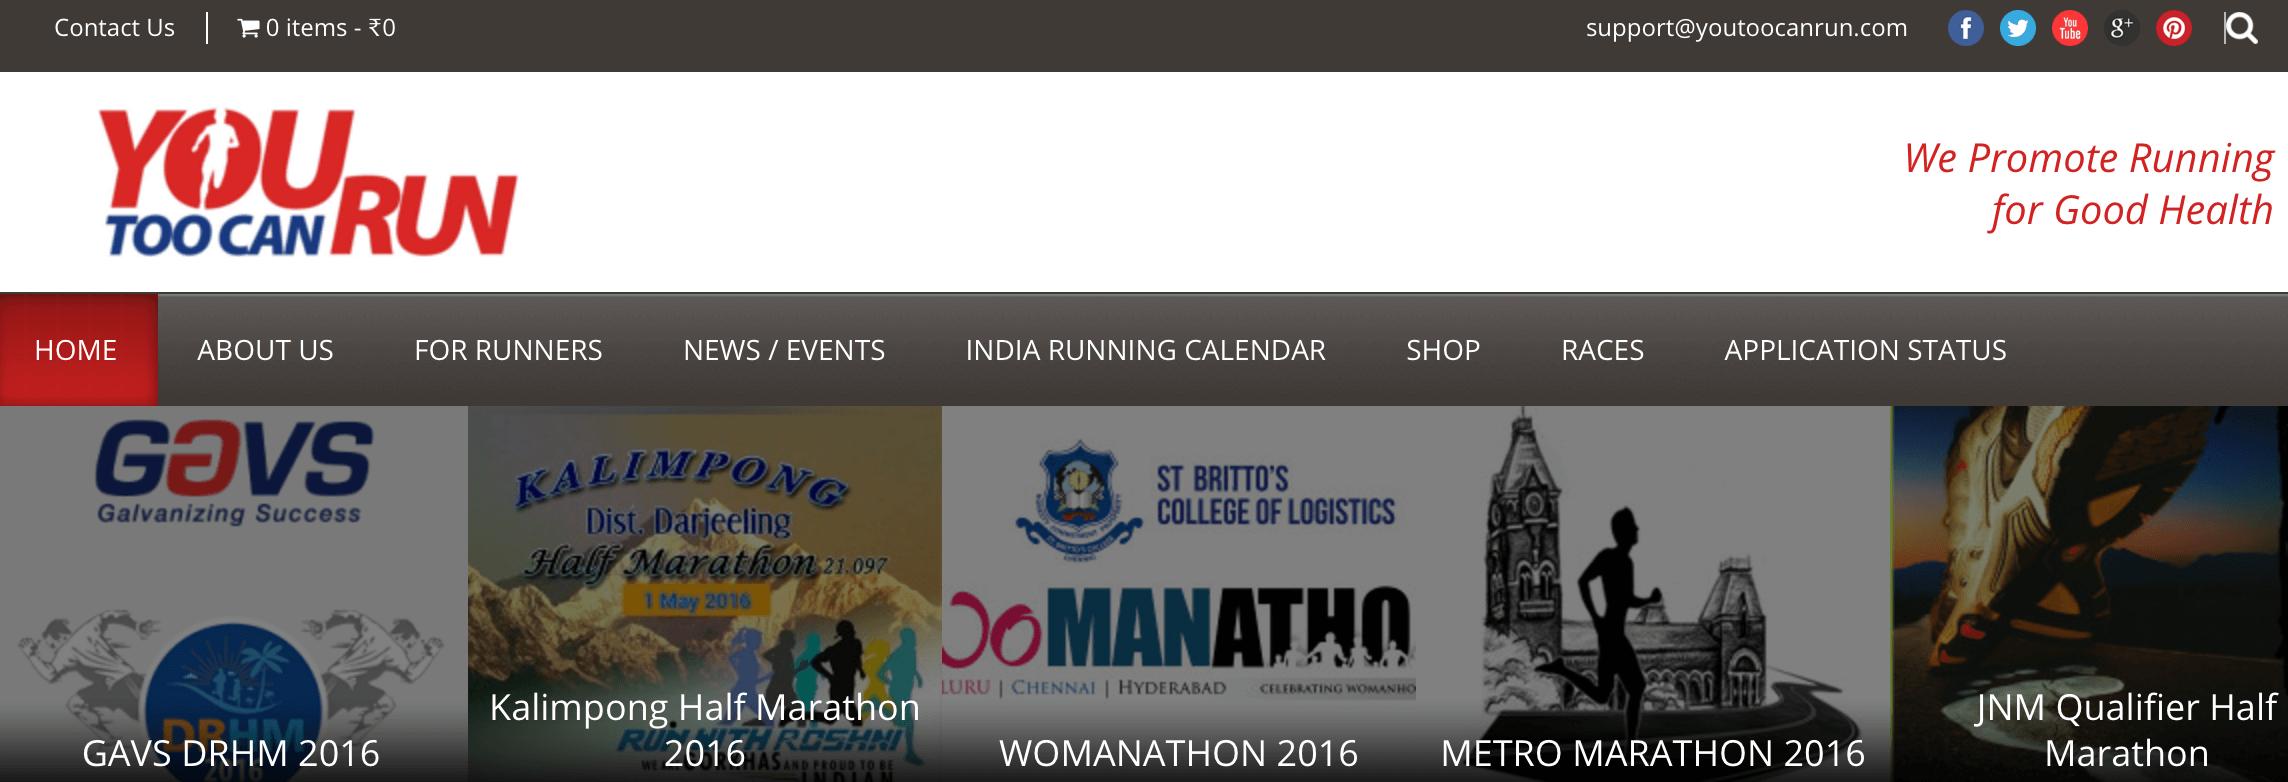 The YouTooCanRun homepage.